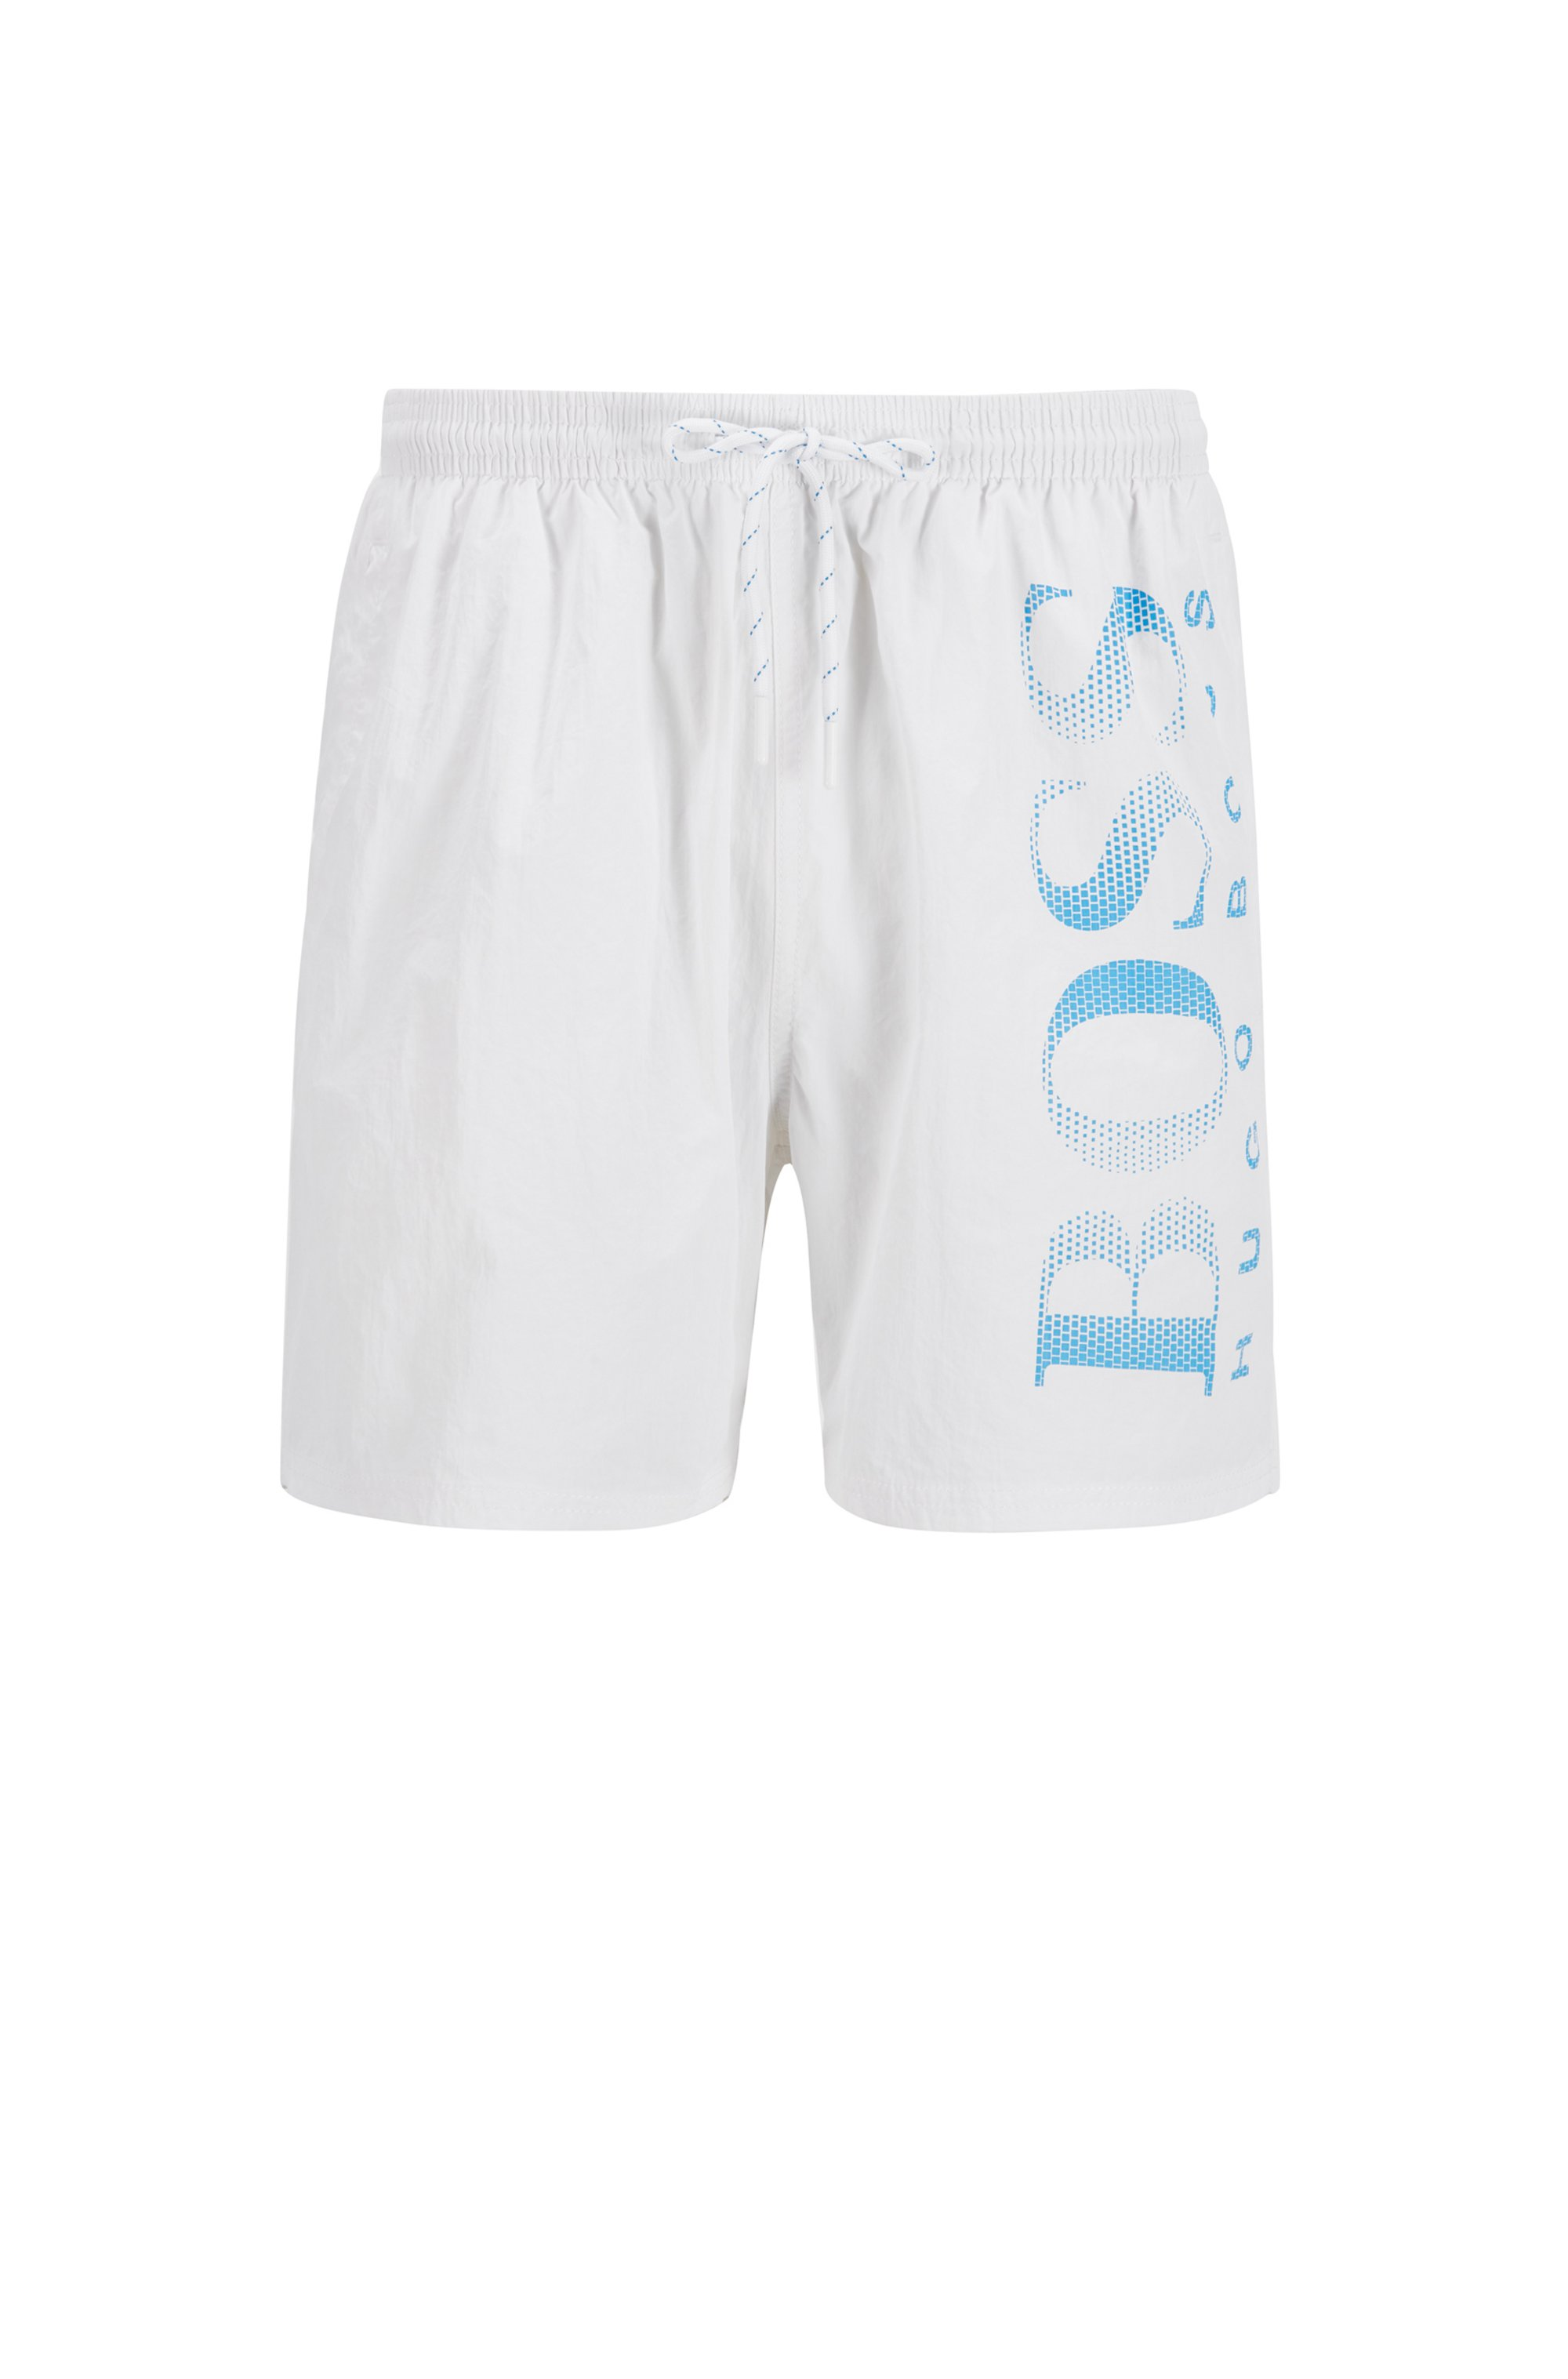 Logo-print swim shorts in technical fabric, White